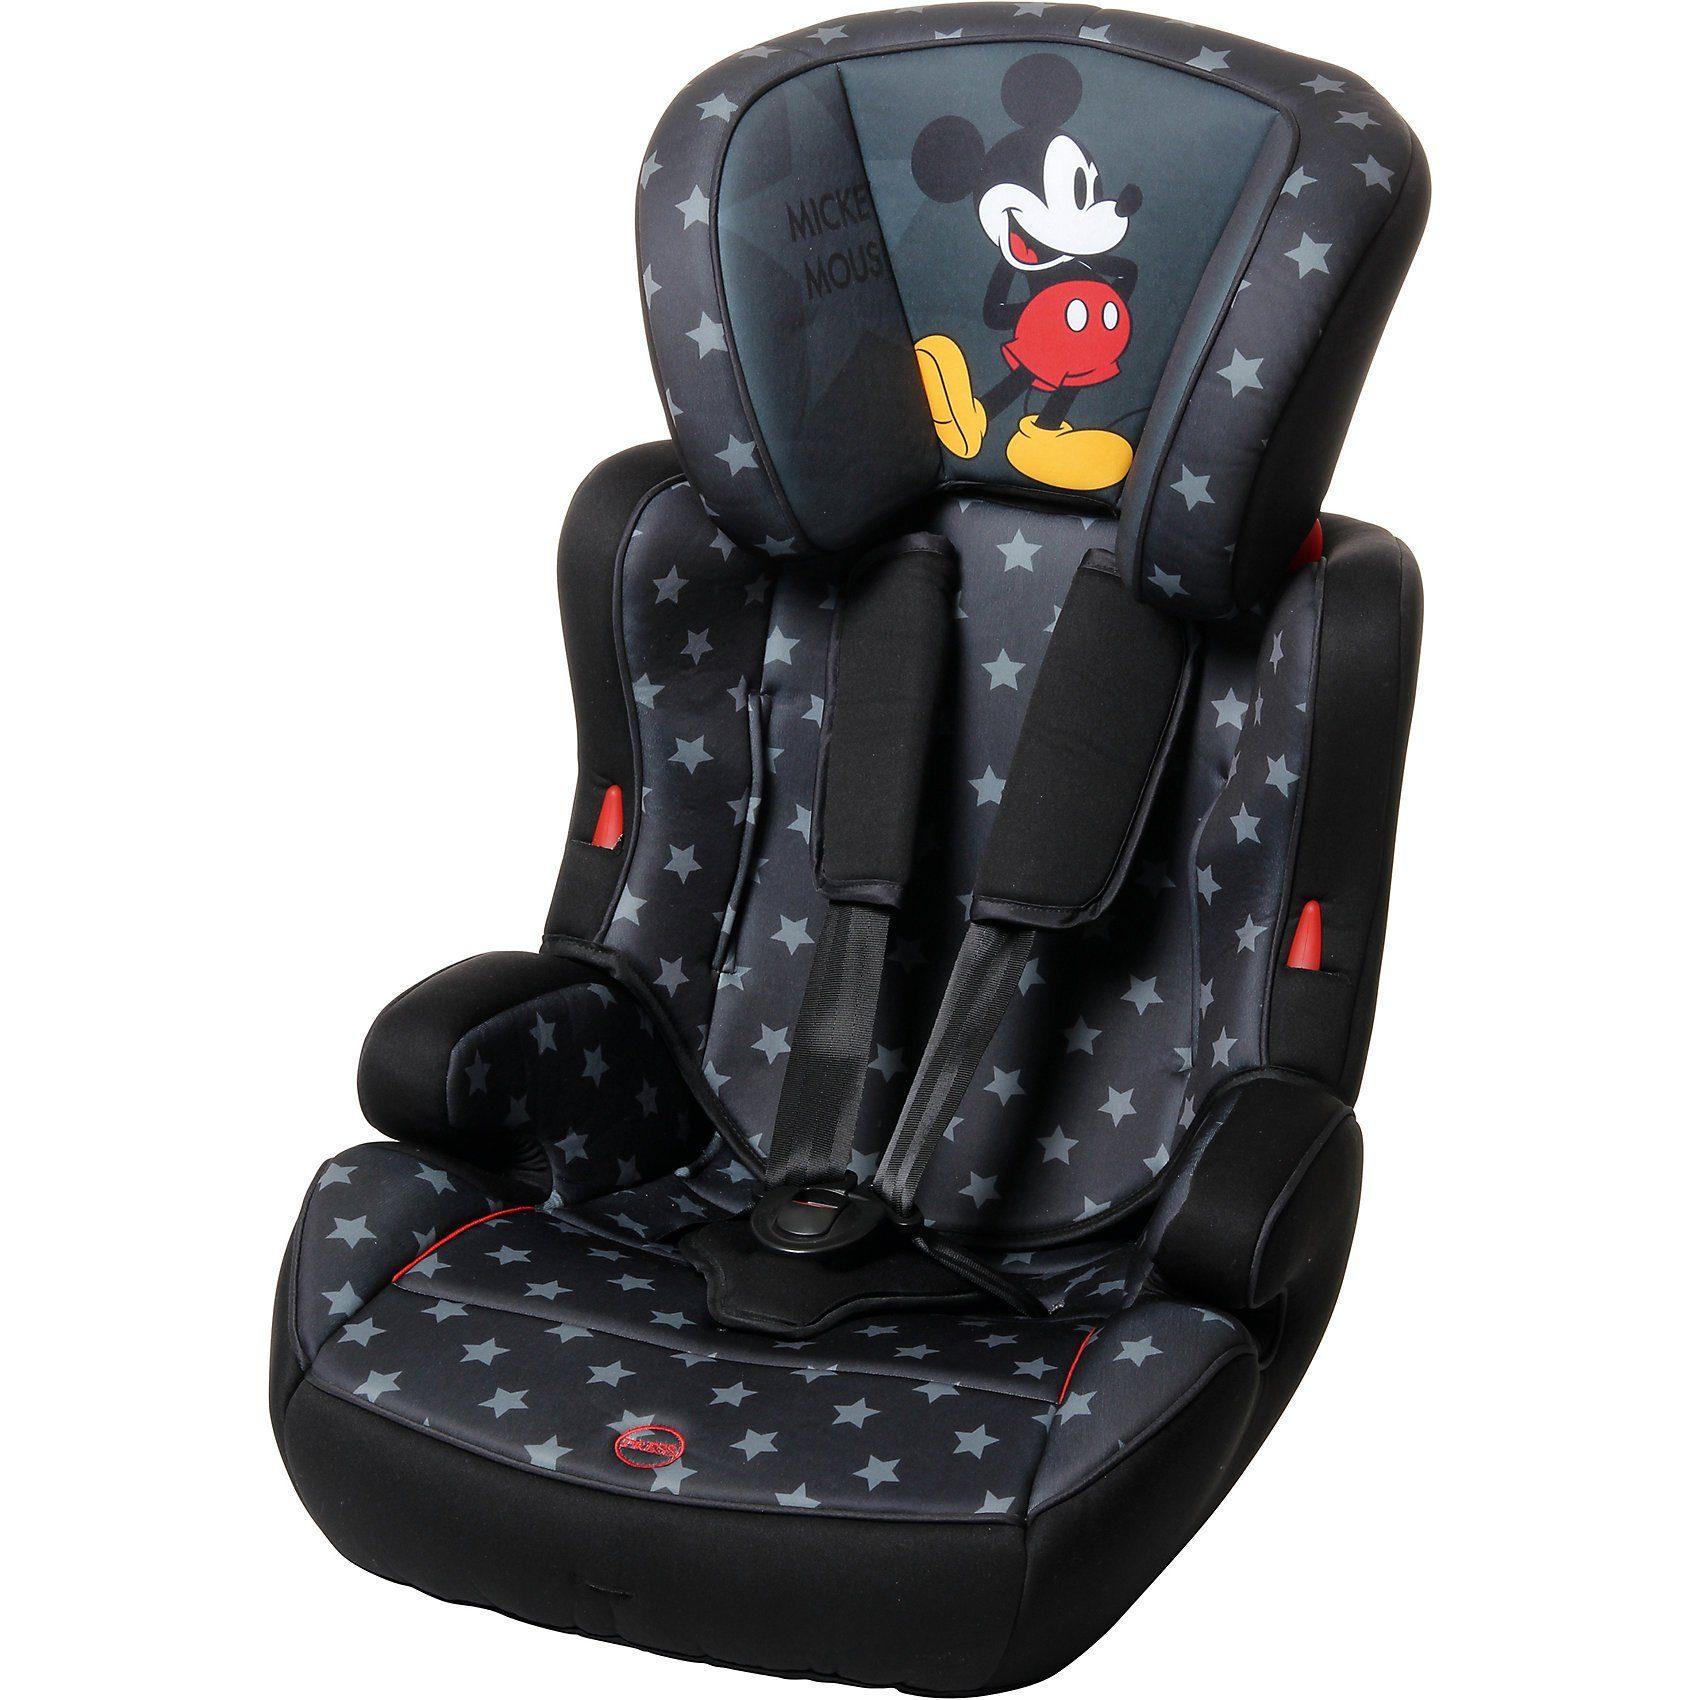 Osann Auto-Kindersitz Lupo, Disney Mickey Mouse, 2018